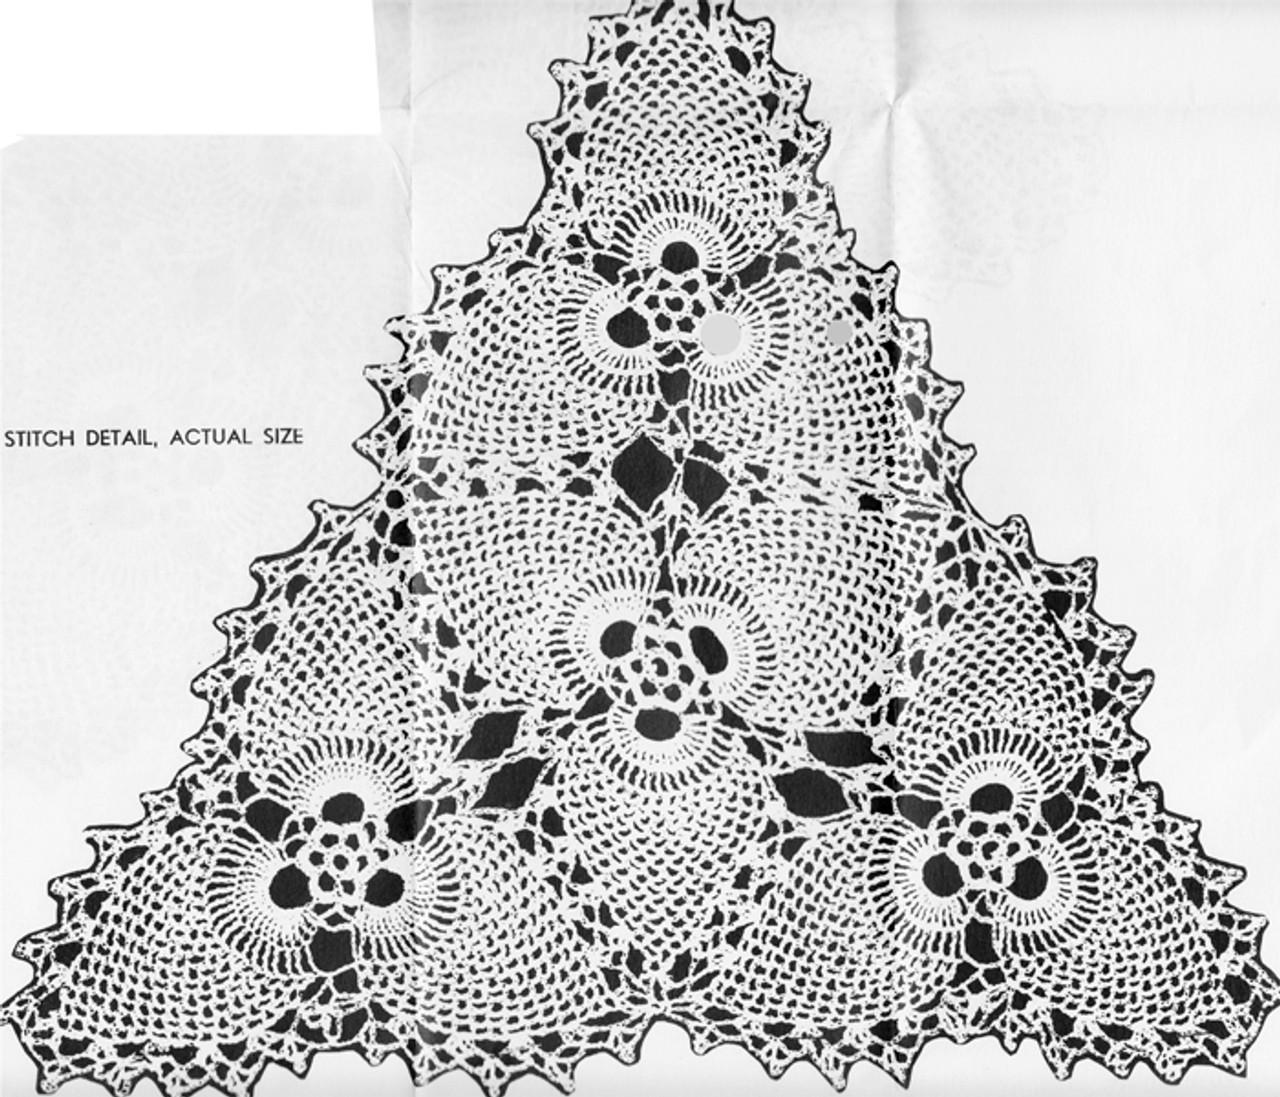 Crochet Illustration of Pineapple Pyramid